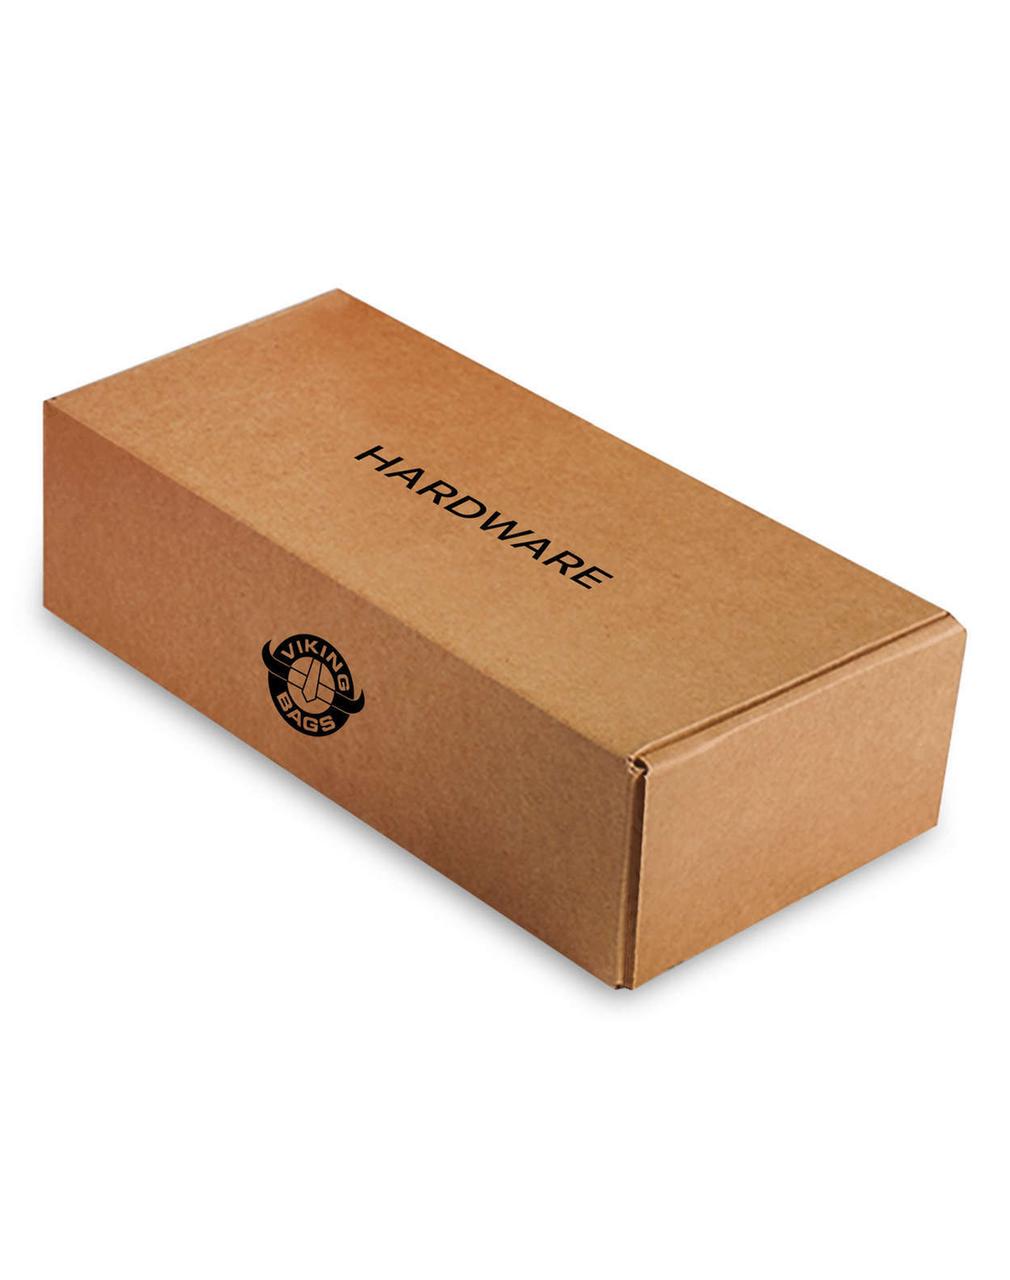 Honda VTX 1800 N Slanted L Motorcycle Saddlebags Box